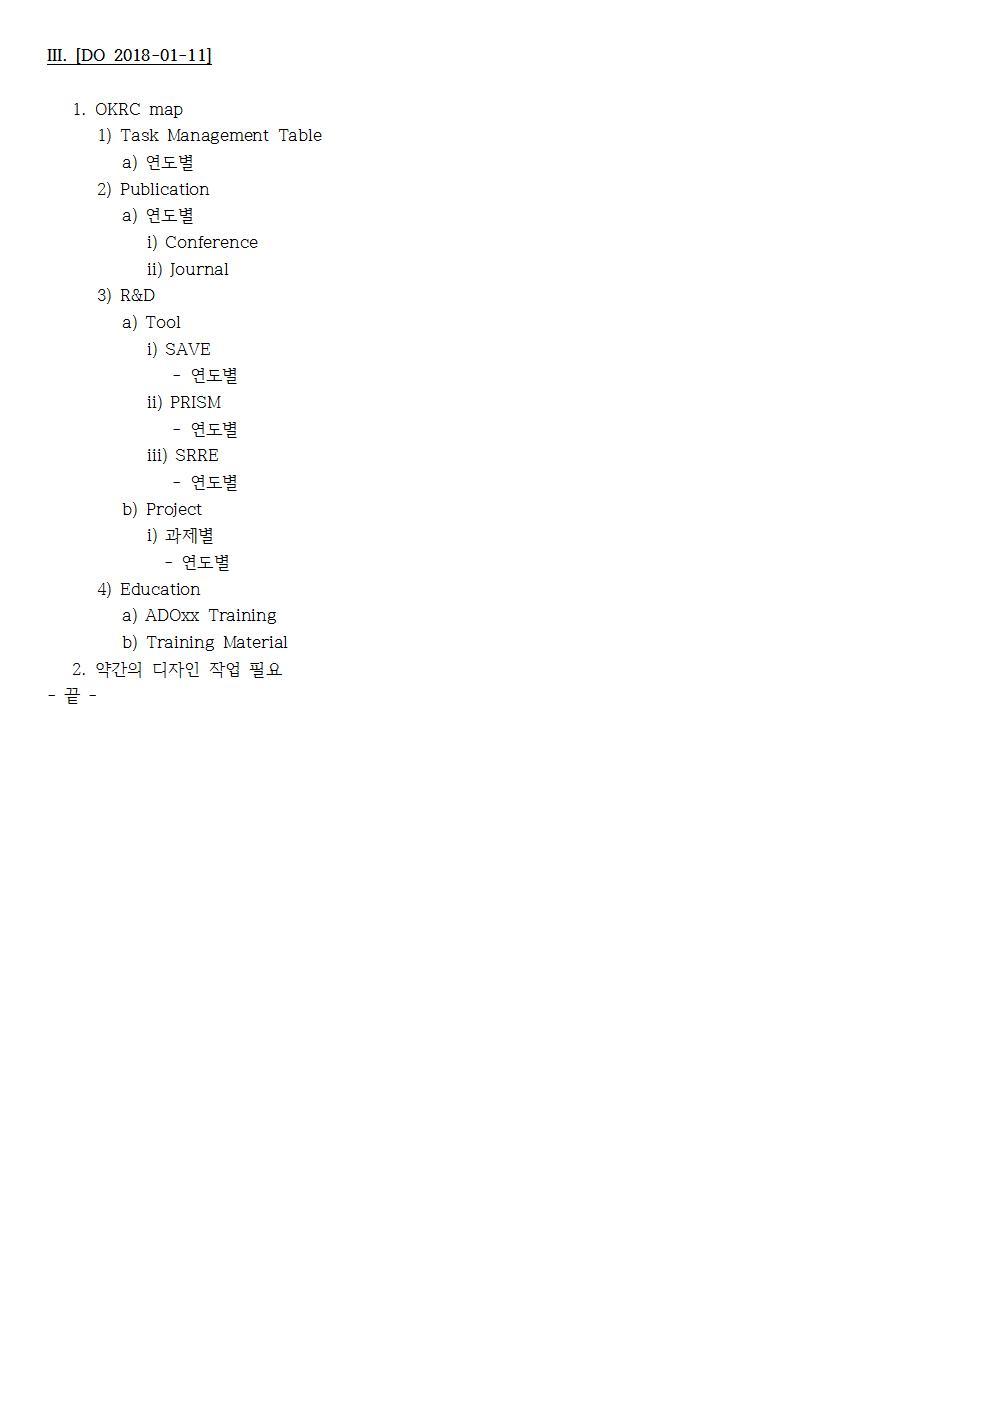 D-[18-030-RC-04]-[OKRC-HP]-[2018-01-11][JS]002.jpg